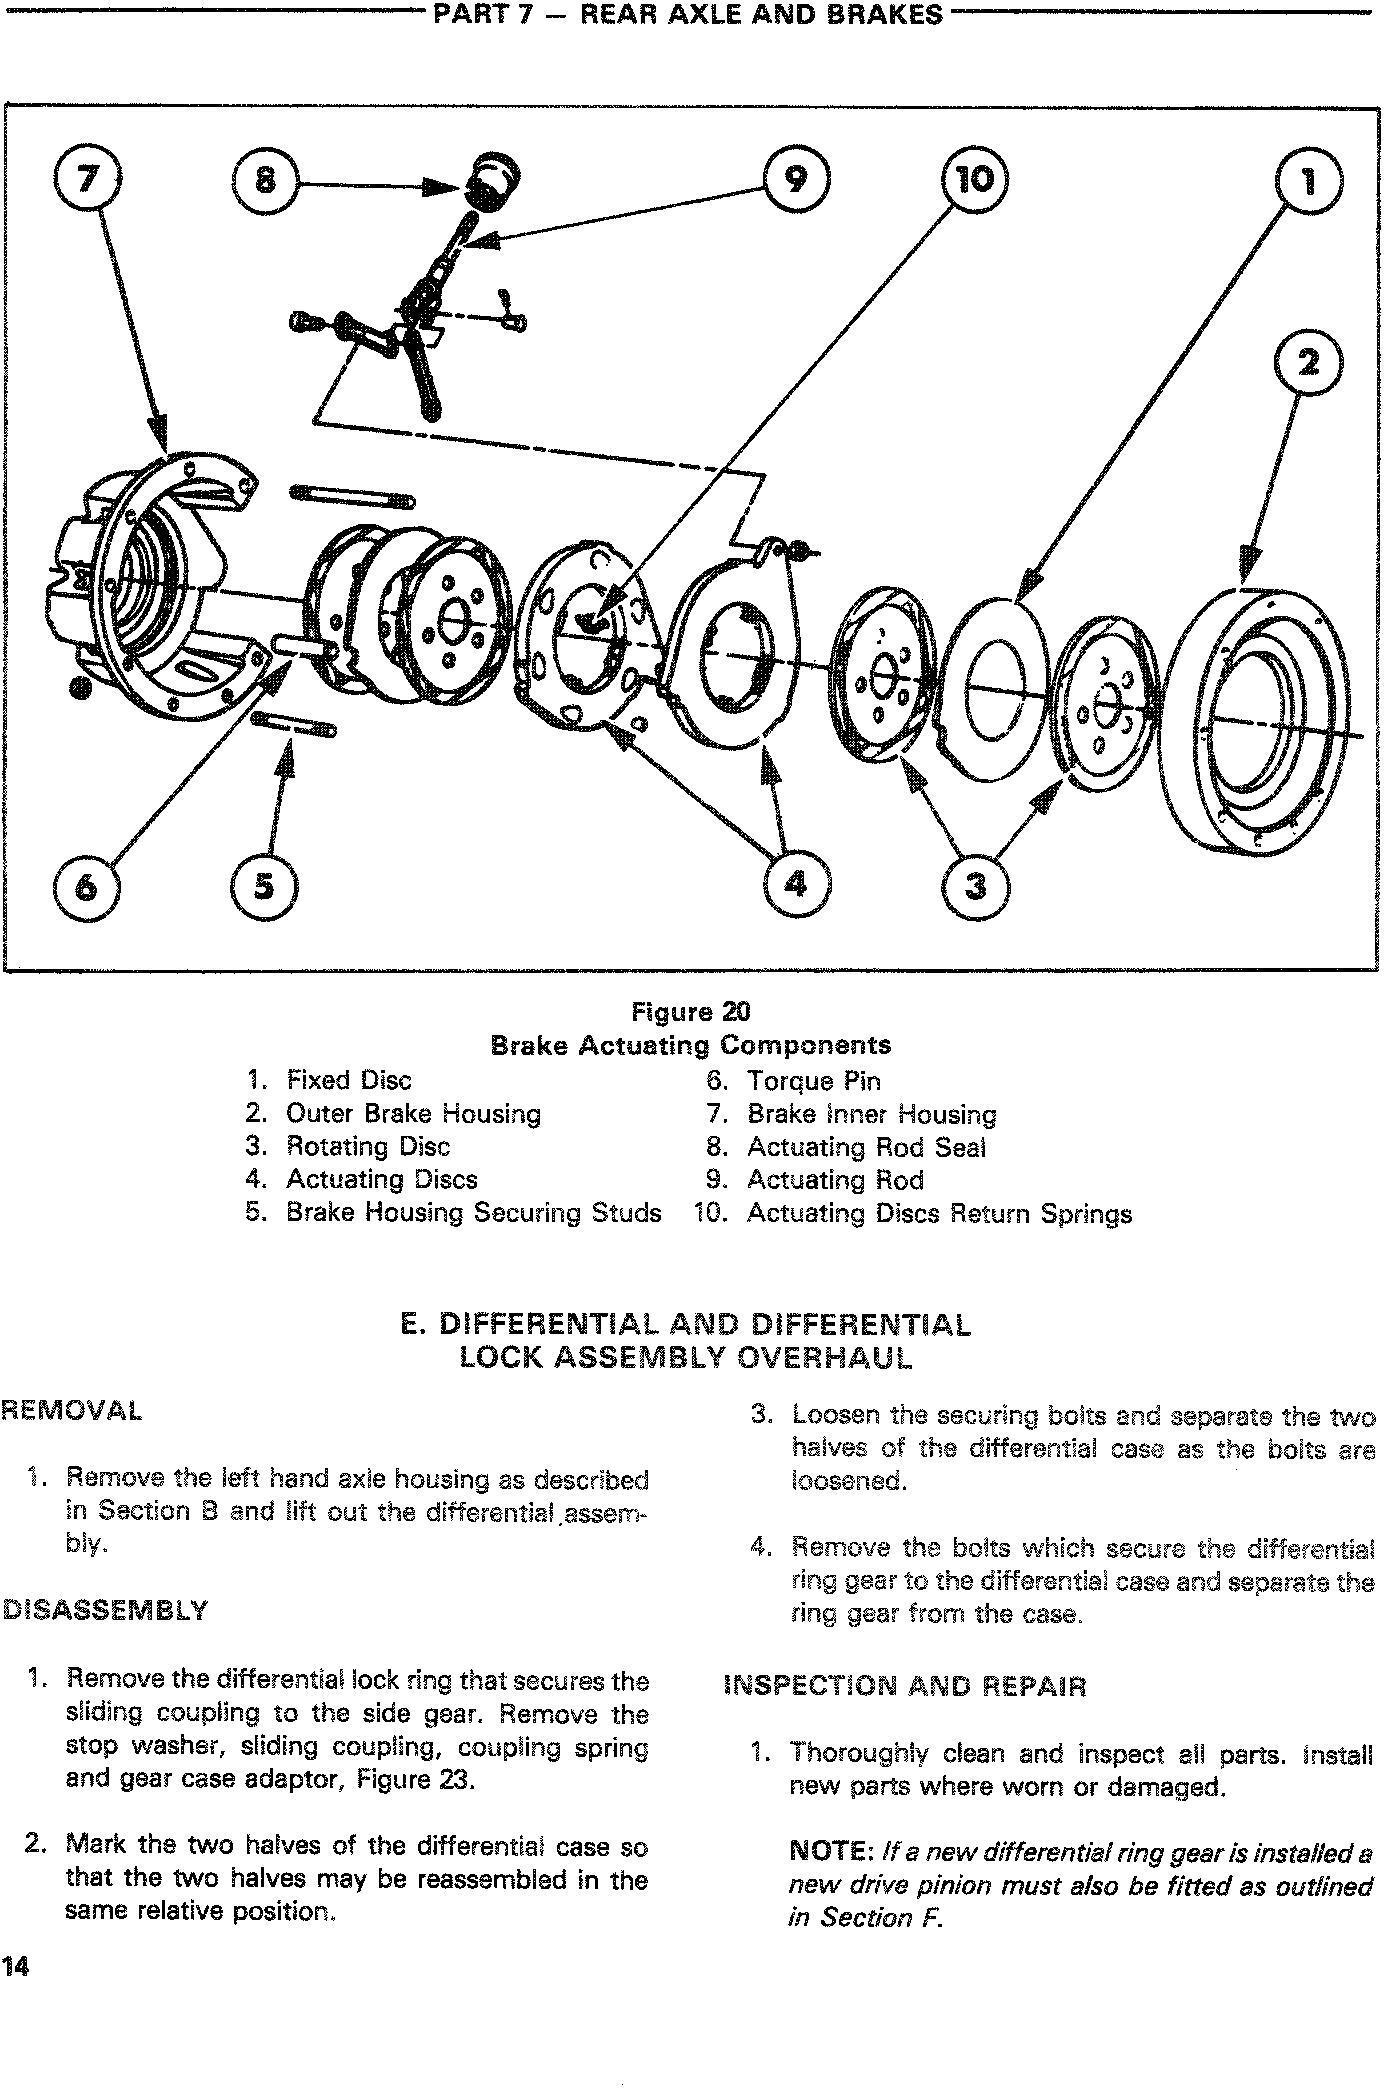 Ford 550, 555 Tractor Loader Backhoe Complete Service Manual - 3